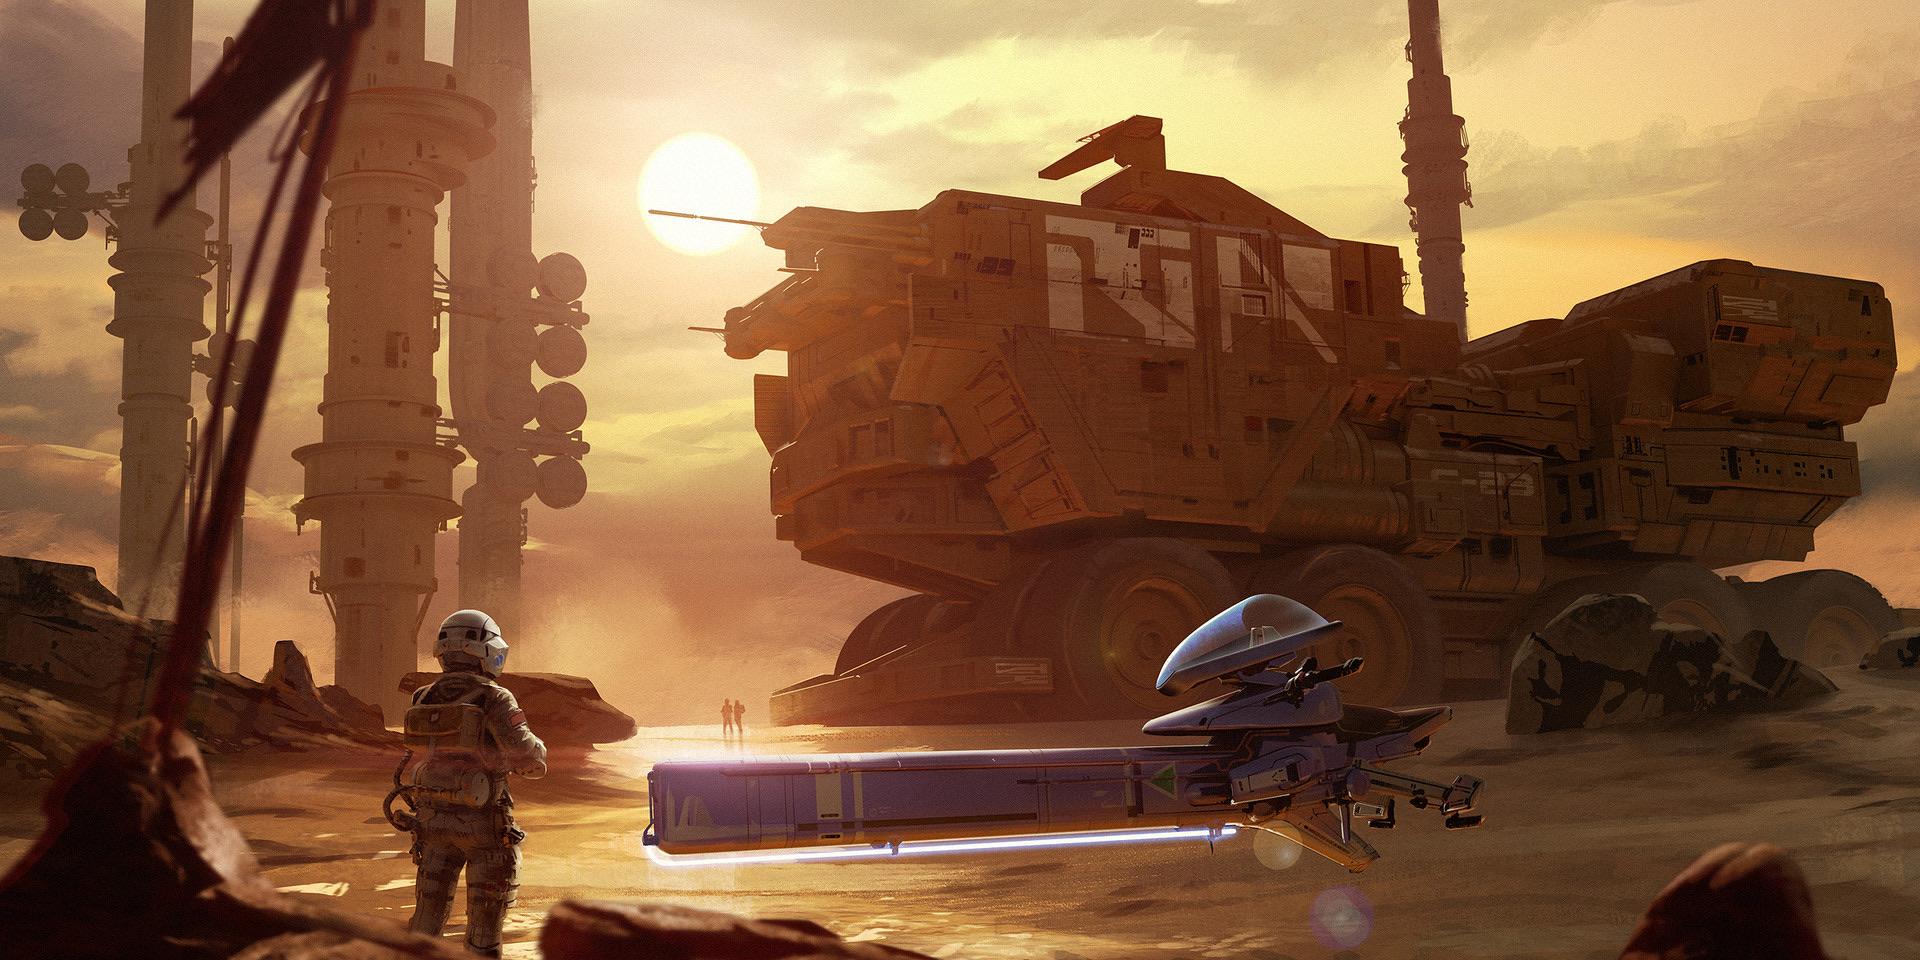 The Incredible Sci-Fi Art of Isaac Hannaford